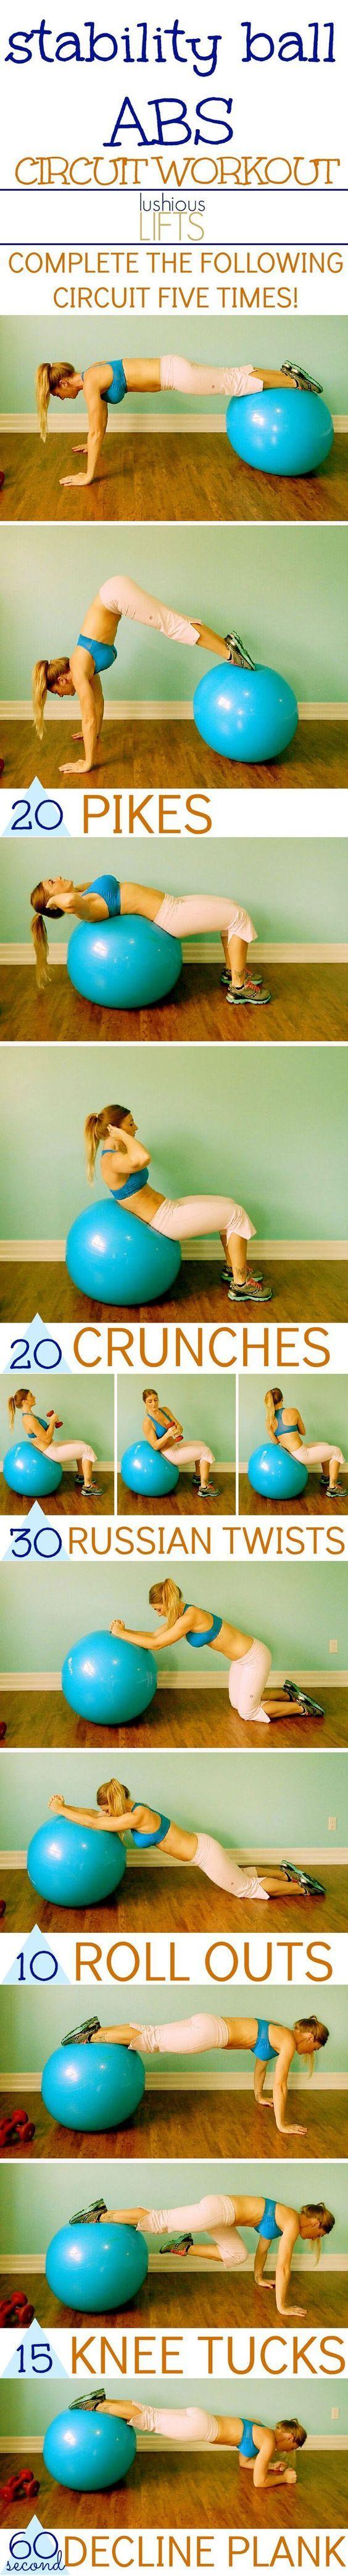 Stability Ball Abdominal Circuit WorkoutStability Ball Abdominal Circuit Workout